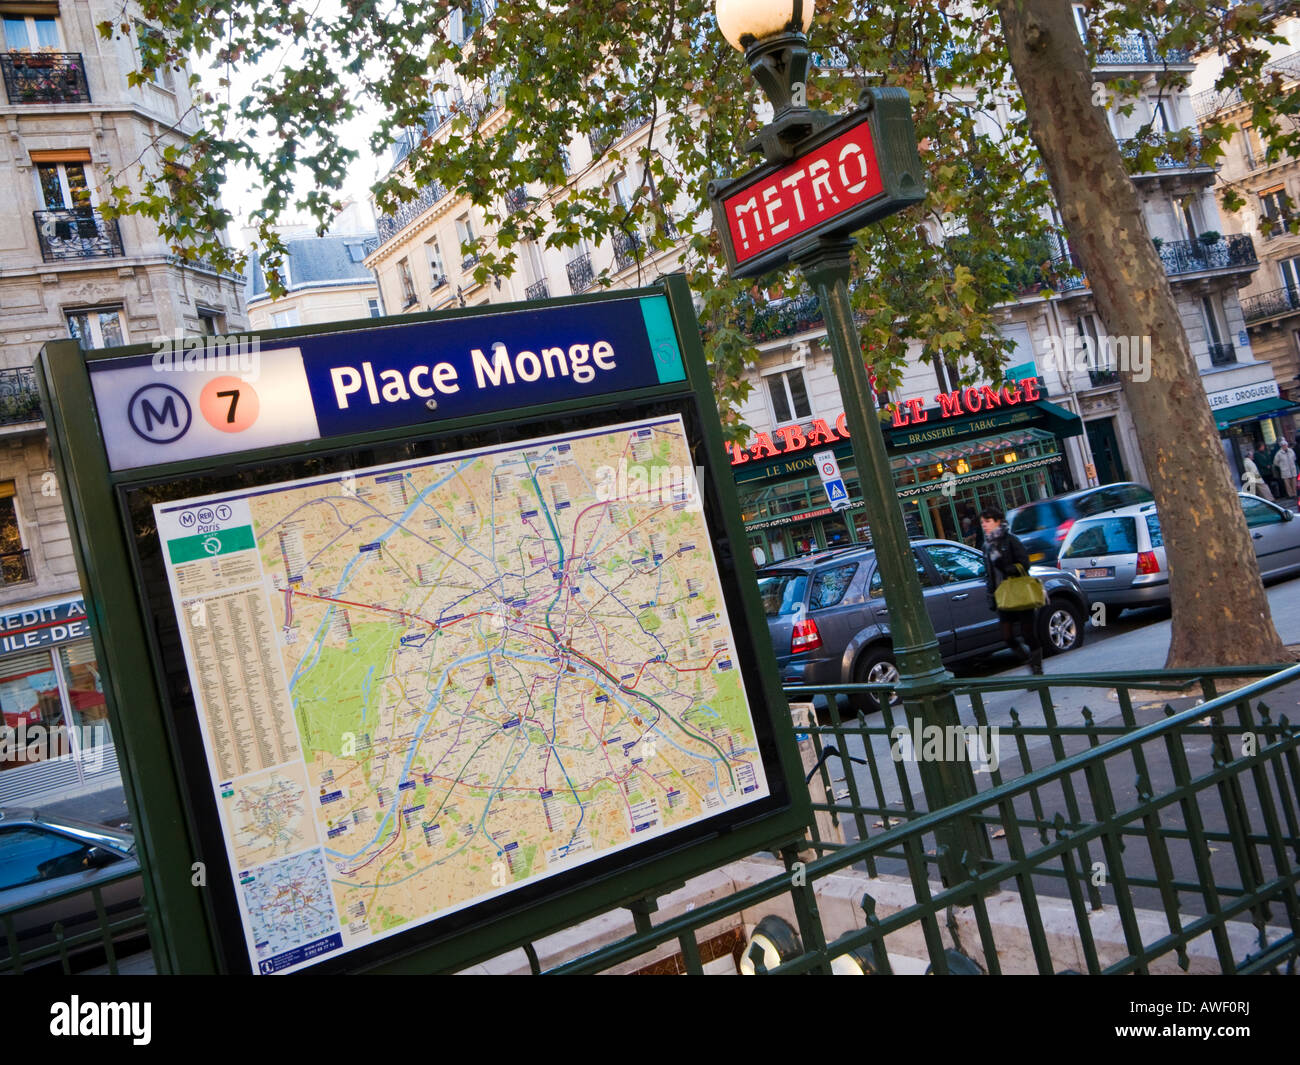 Entrance To Place Monge Paris Metro Station With Sign And Map Stock - Paris metro station map